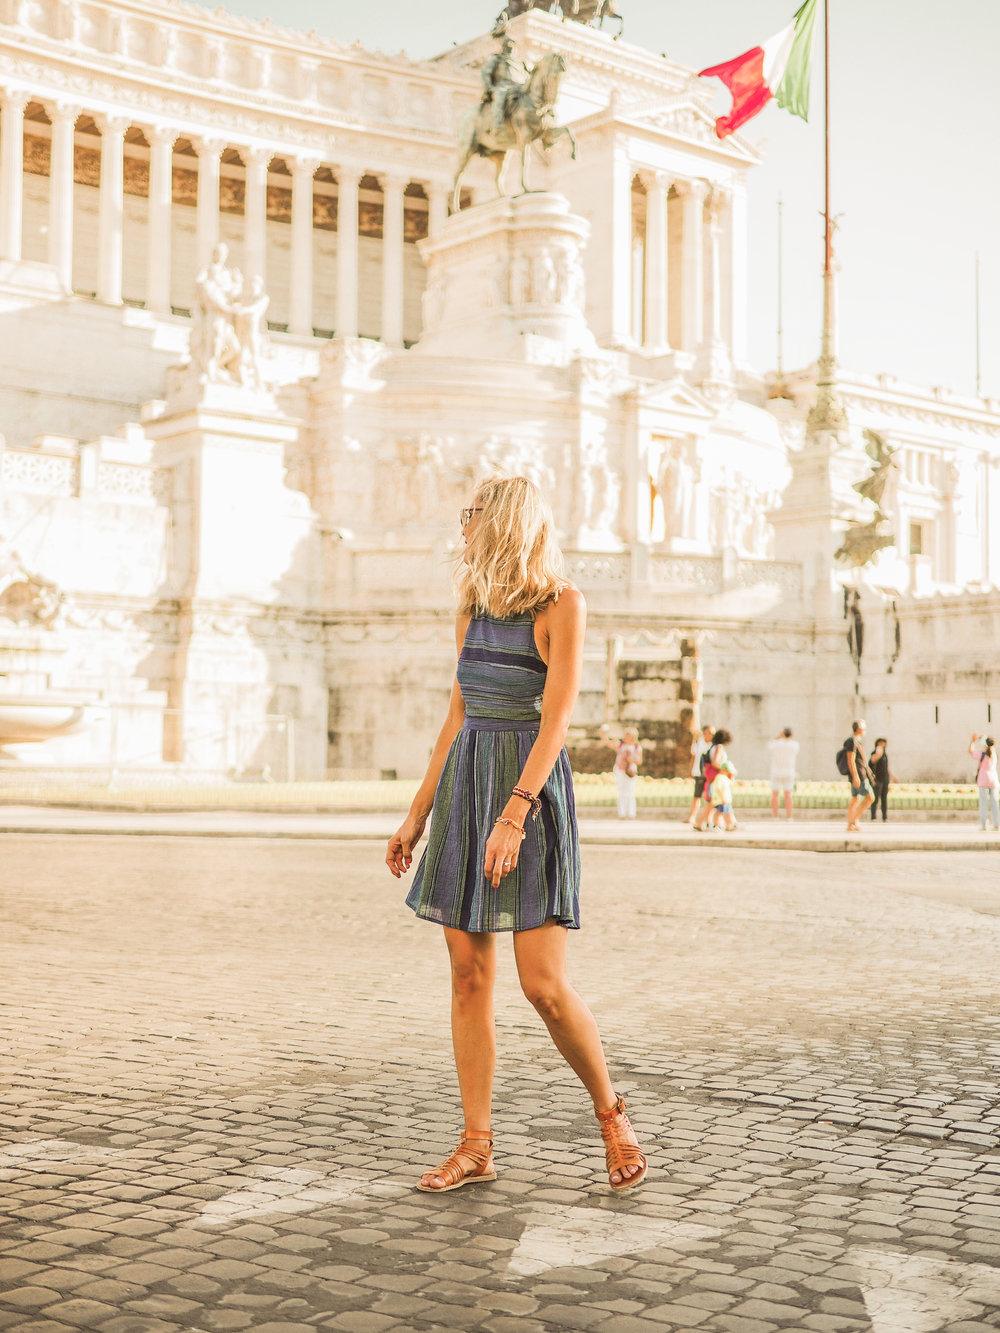 Rome dametraveler